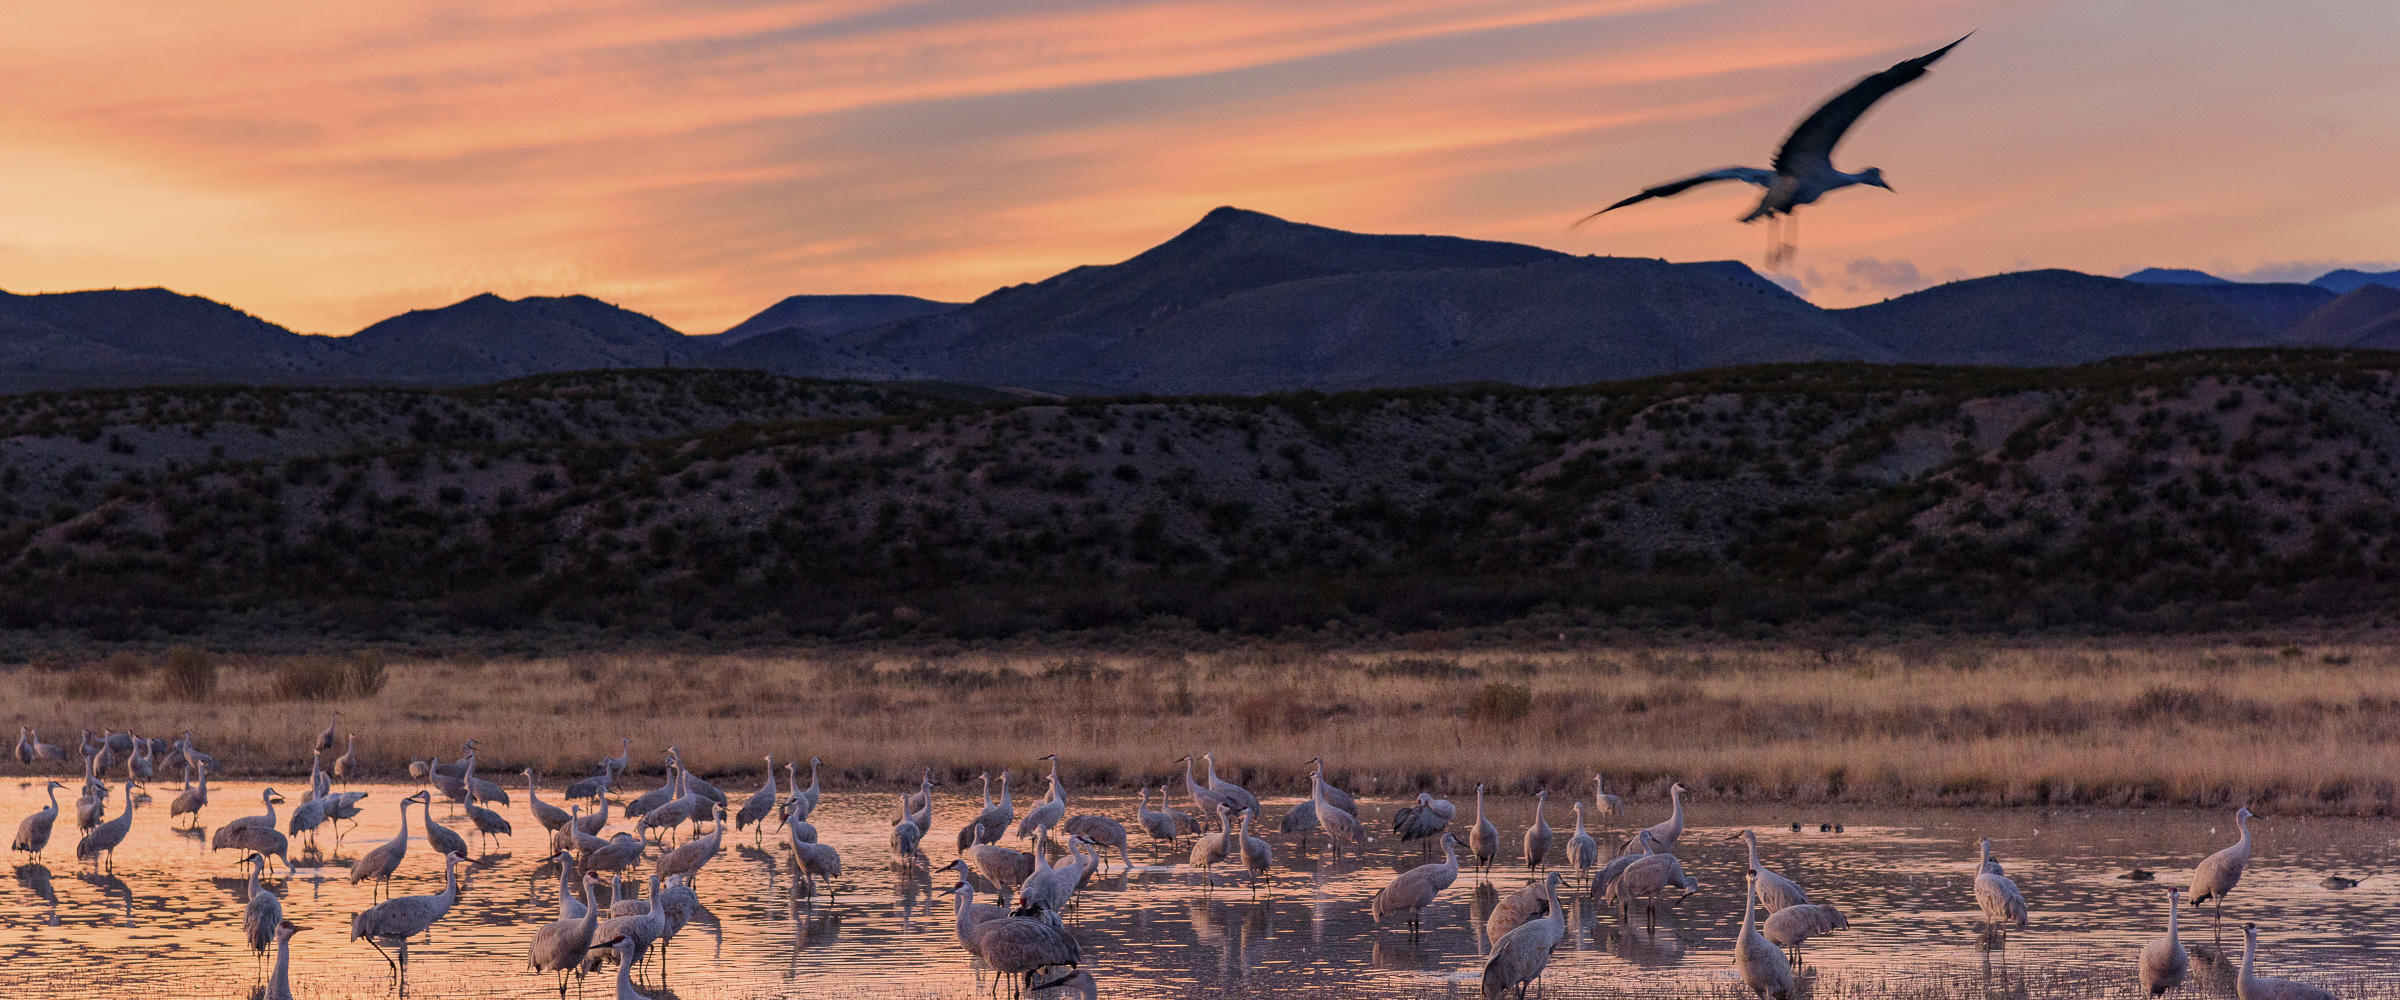 Sandhill Cranes Western Rivers Initaitive Audubon Rockies